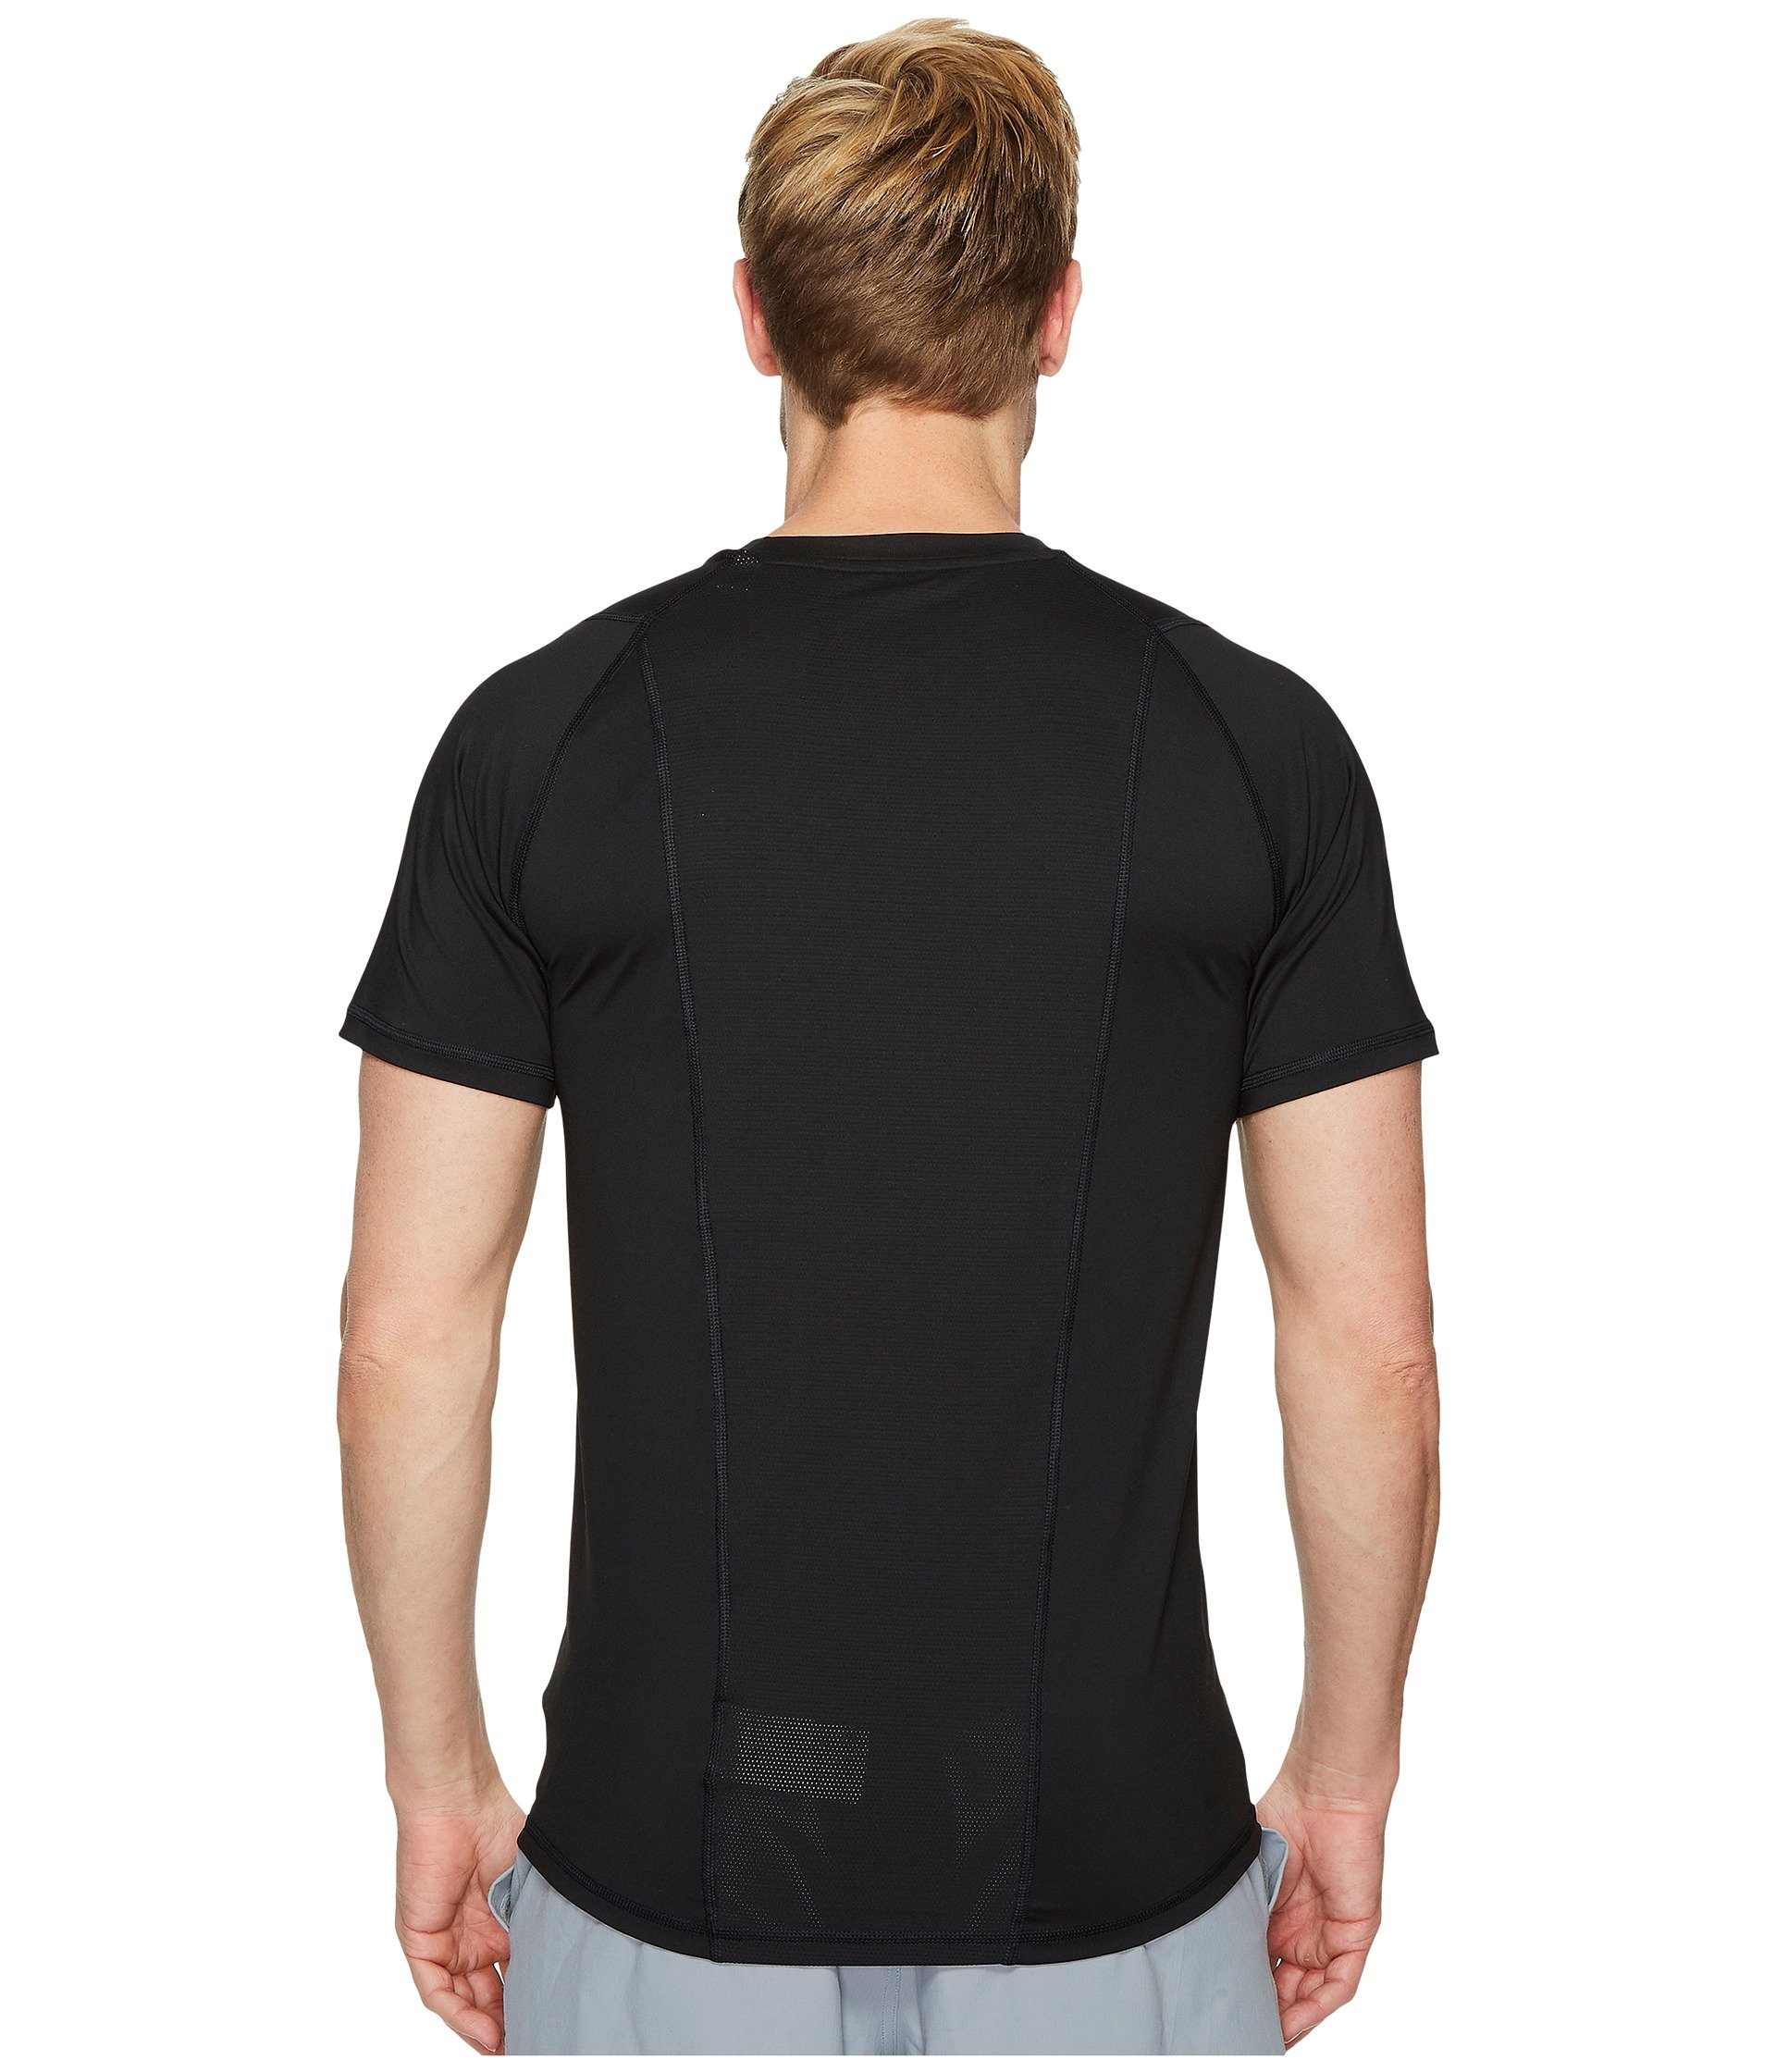 Alphaskin Sleeve Adidas Sport Black Fitted Tee Short PFwAvnq